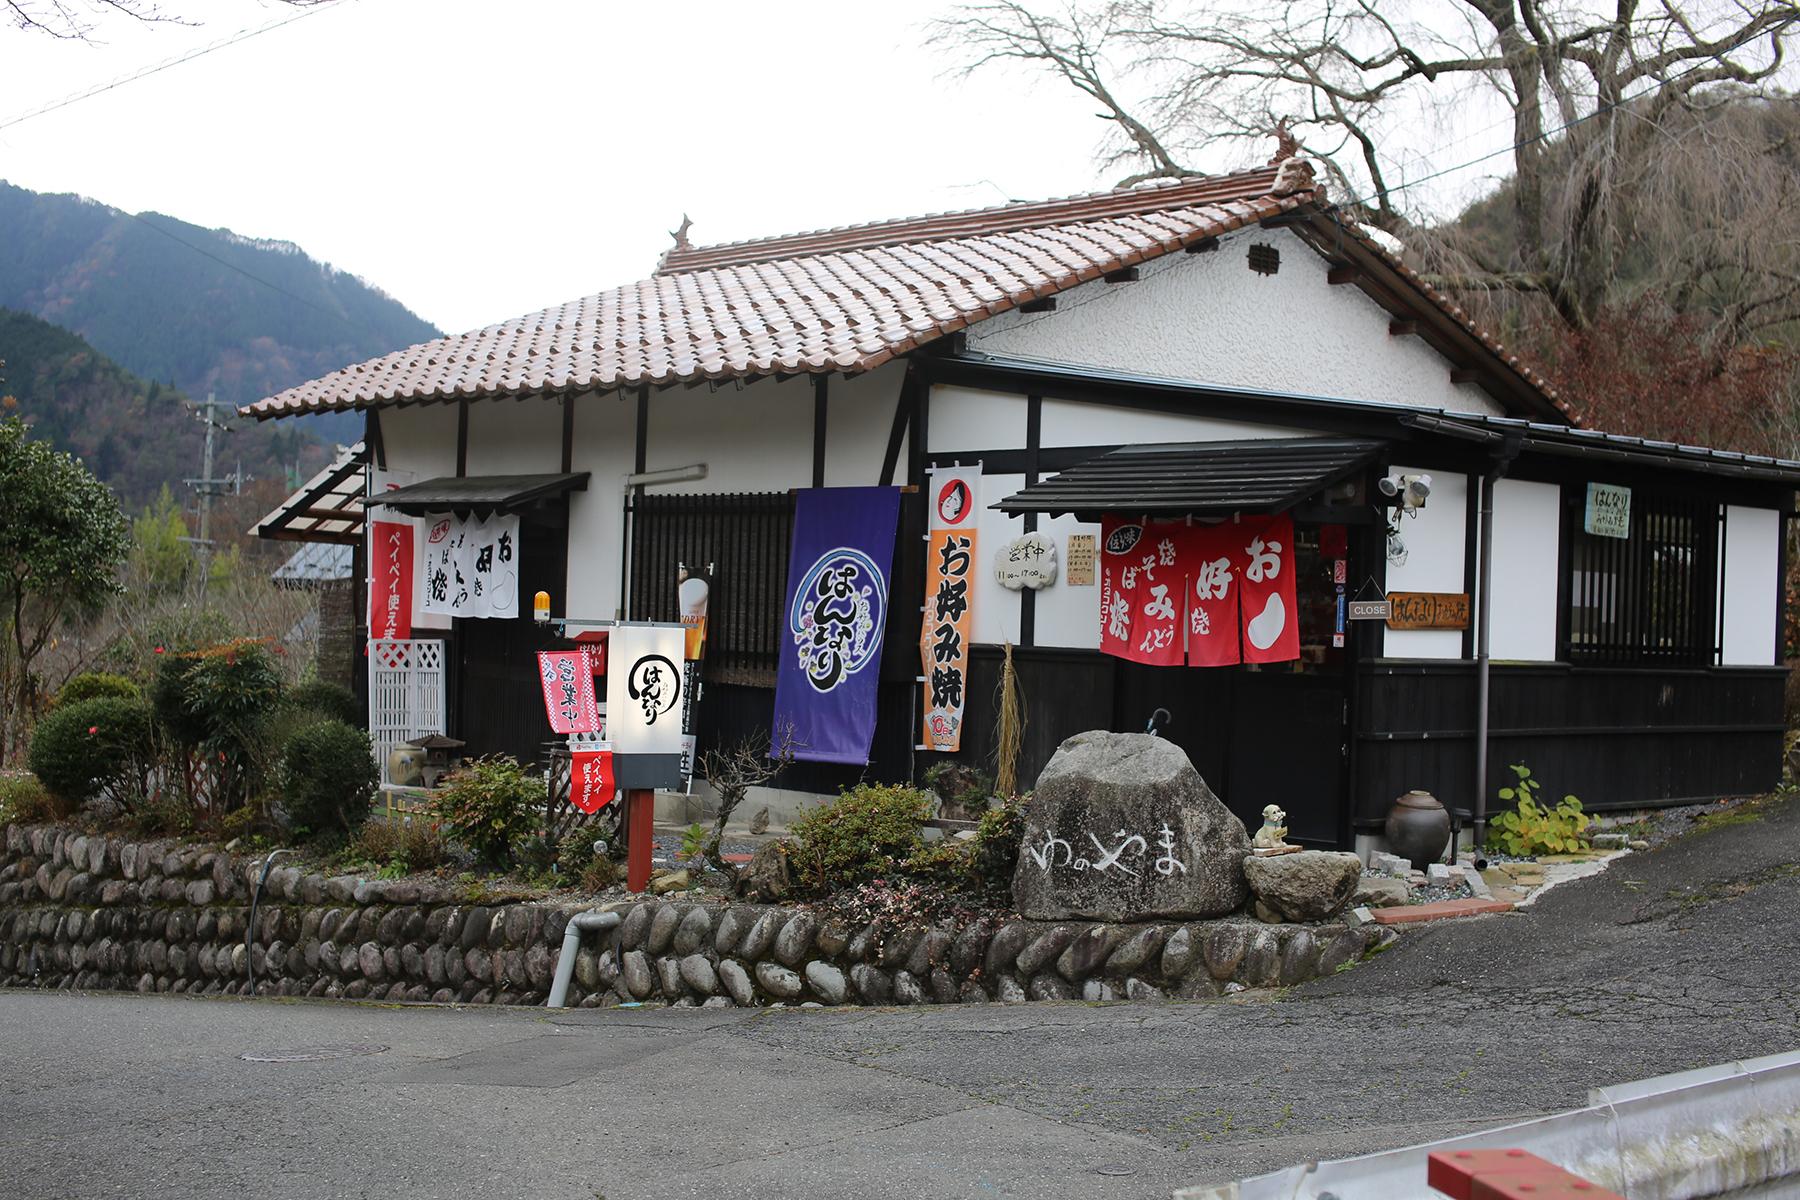 Okonomi-yaki Restaurant Han'nari